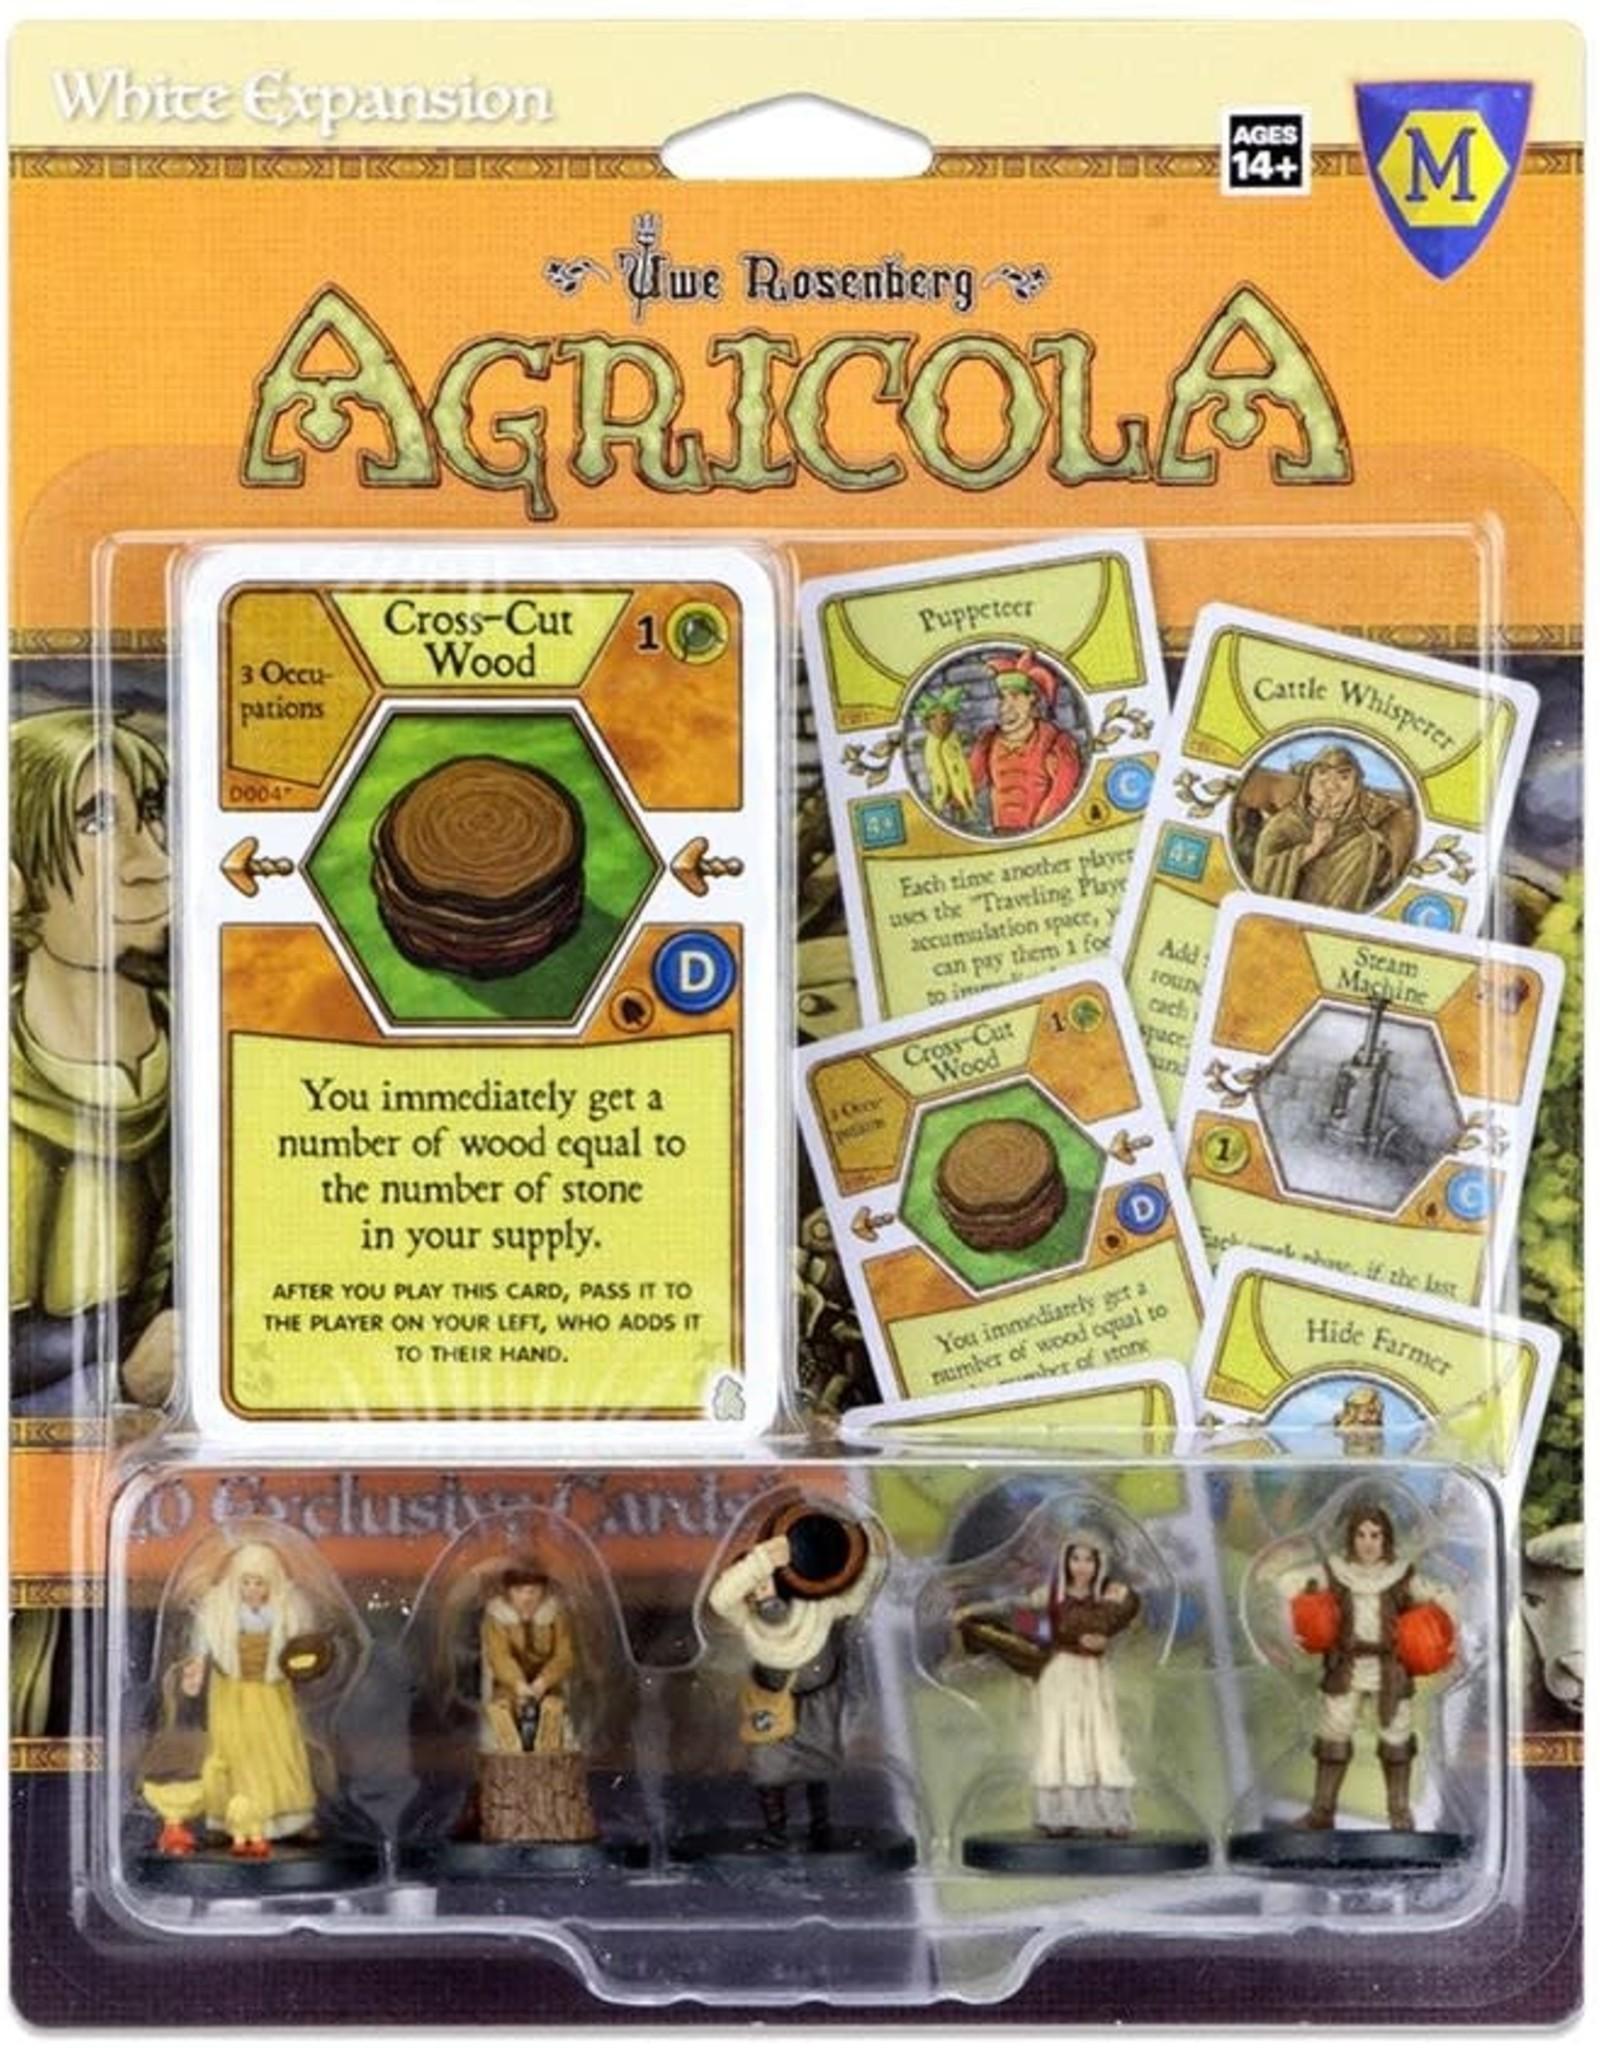 WizKids Agricola: White Exp.